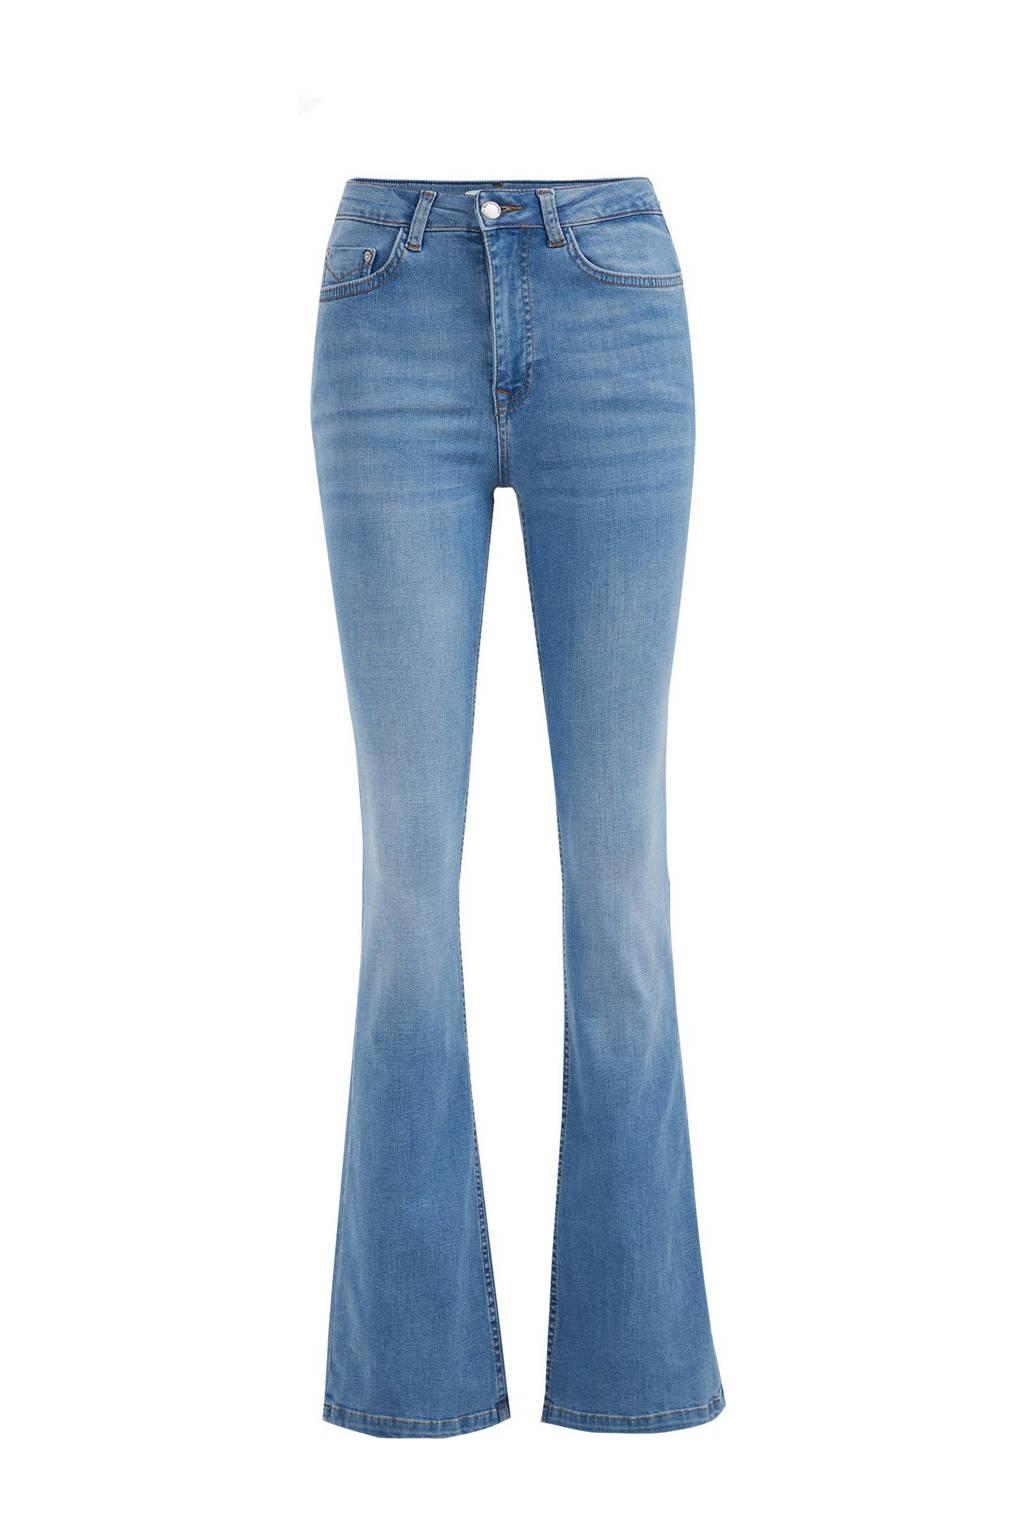 WE Fashion Blue Ridge flared jeans used denim, Used denim